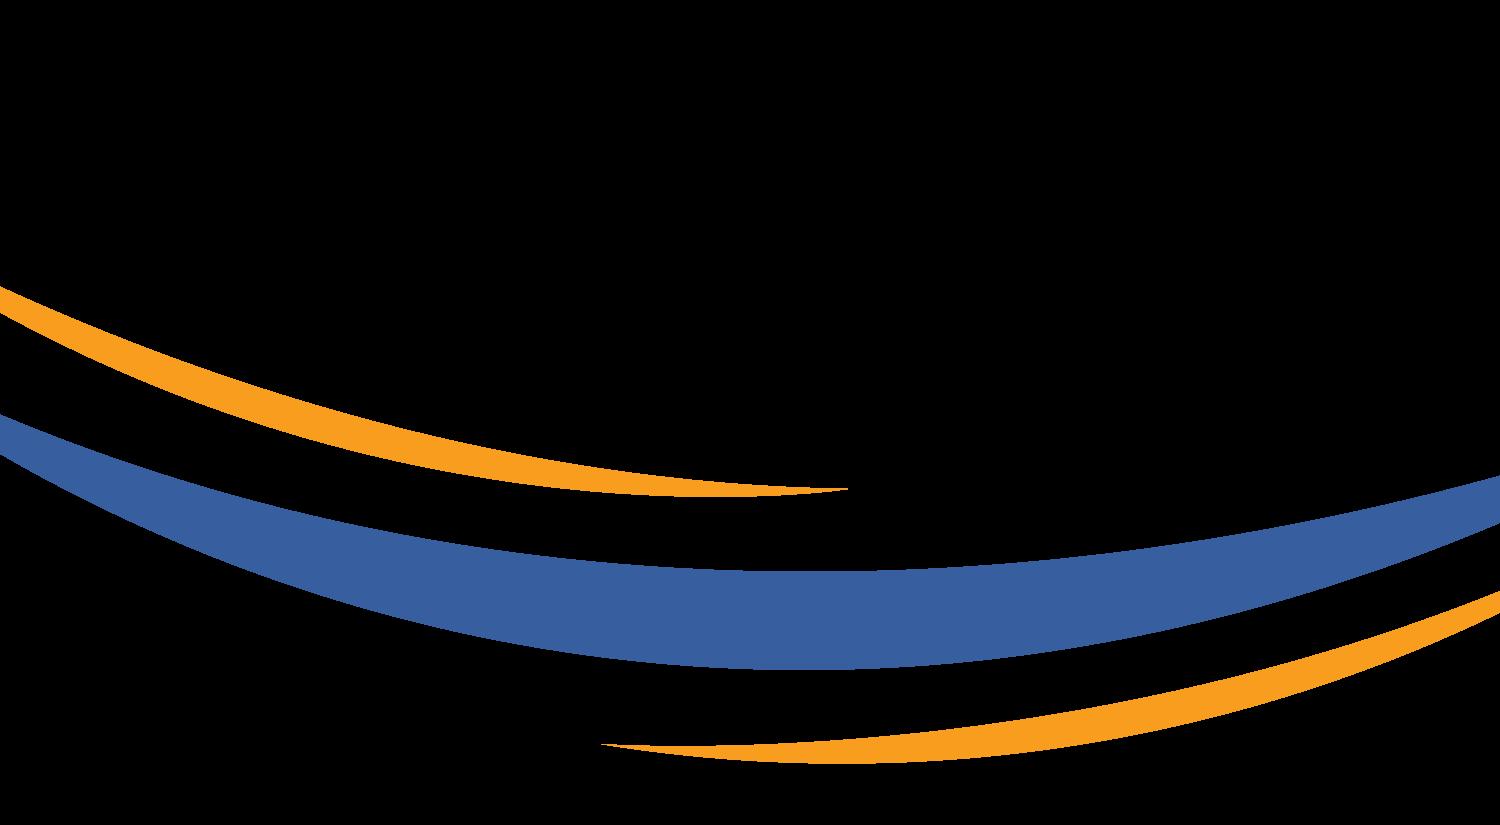 Enteris BioPharma orange-and-medium-blue lower logo swoosh